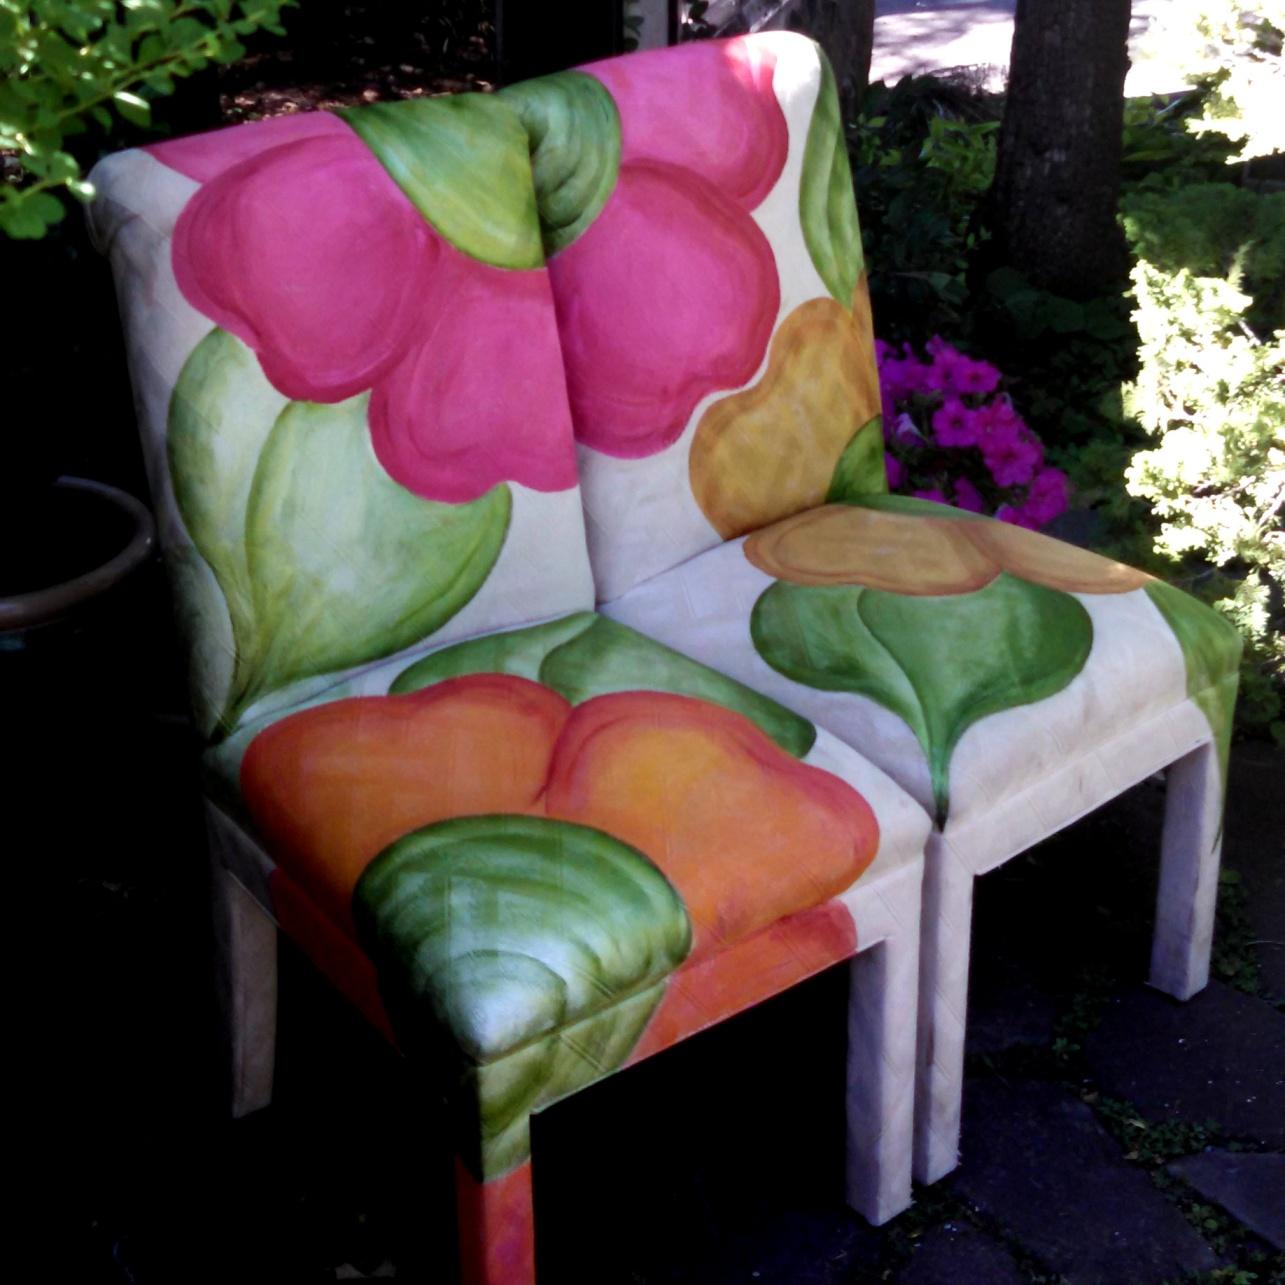 chairs-painted-parsons-dipytk-for-web-c2018-carole-shiber.jpg